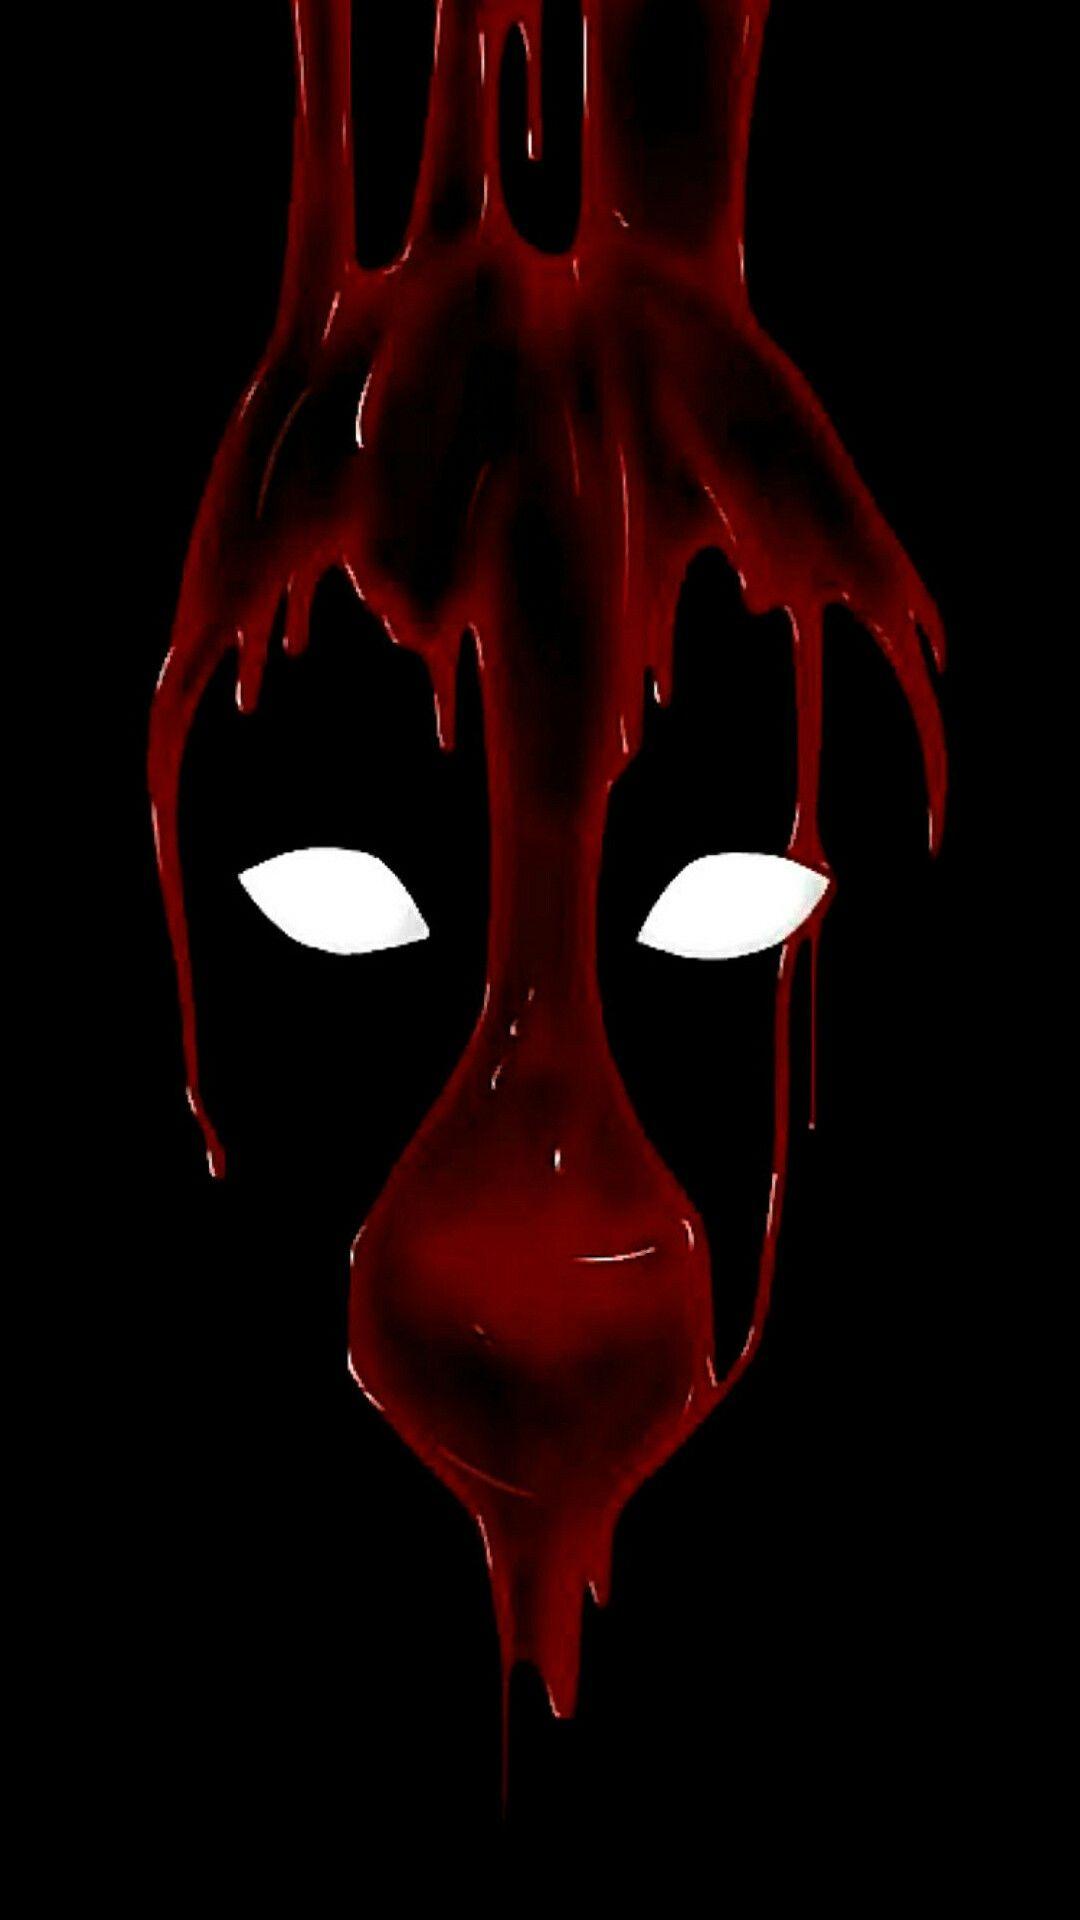 Deadpool Wallpaper Deadpool Deadpool Deadpool wallpaper 1080x1920